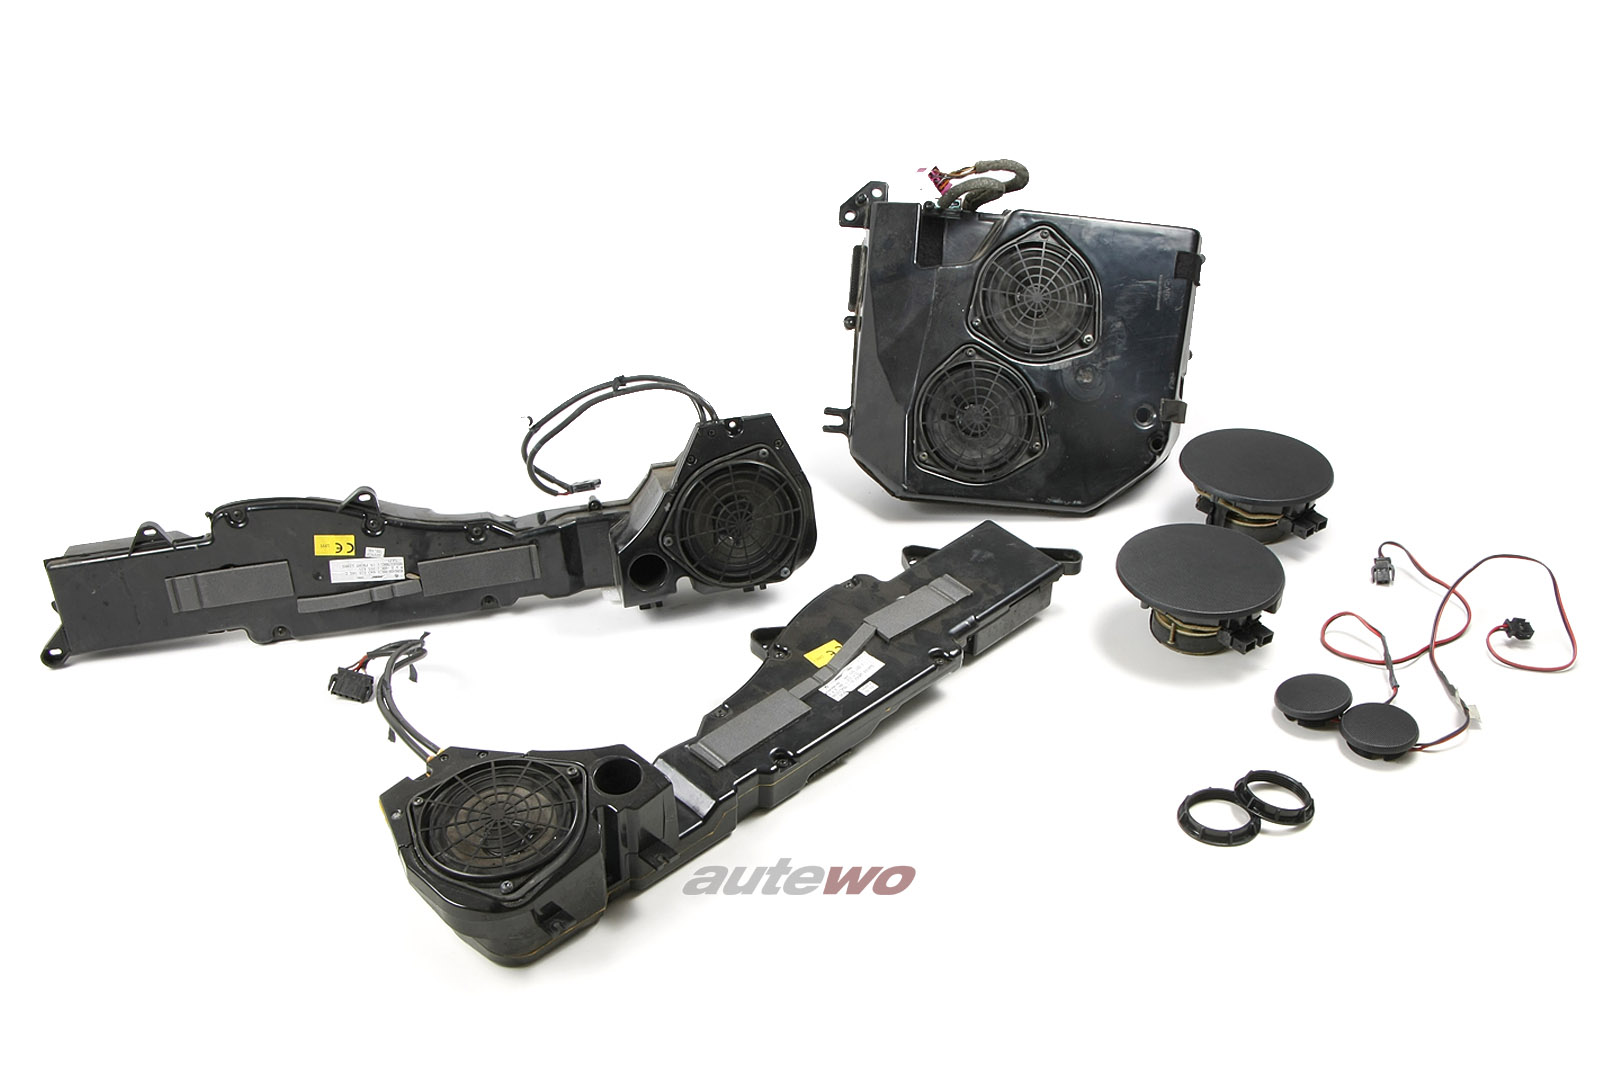 Audi 100/S4/A6/S6 C4 Avant Set Bose-Soundsystem komplett inkl. Kabelbaum